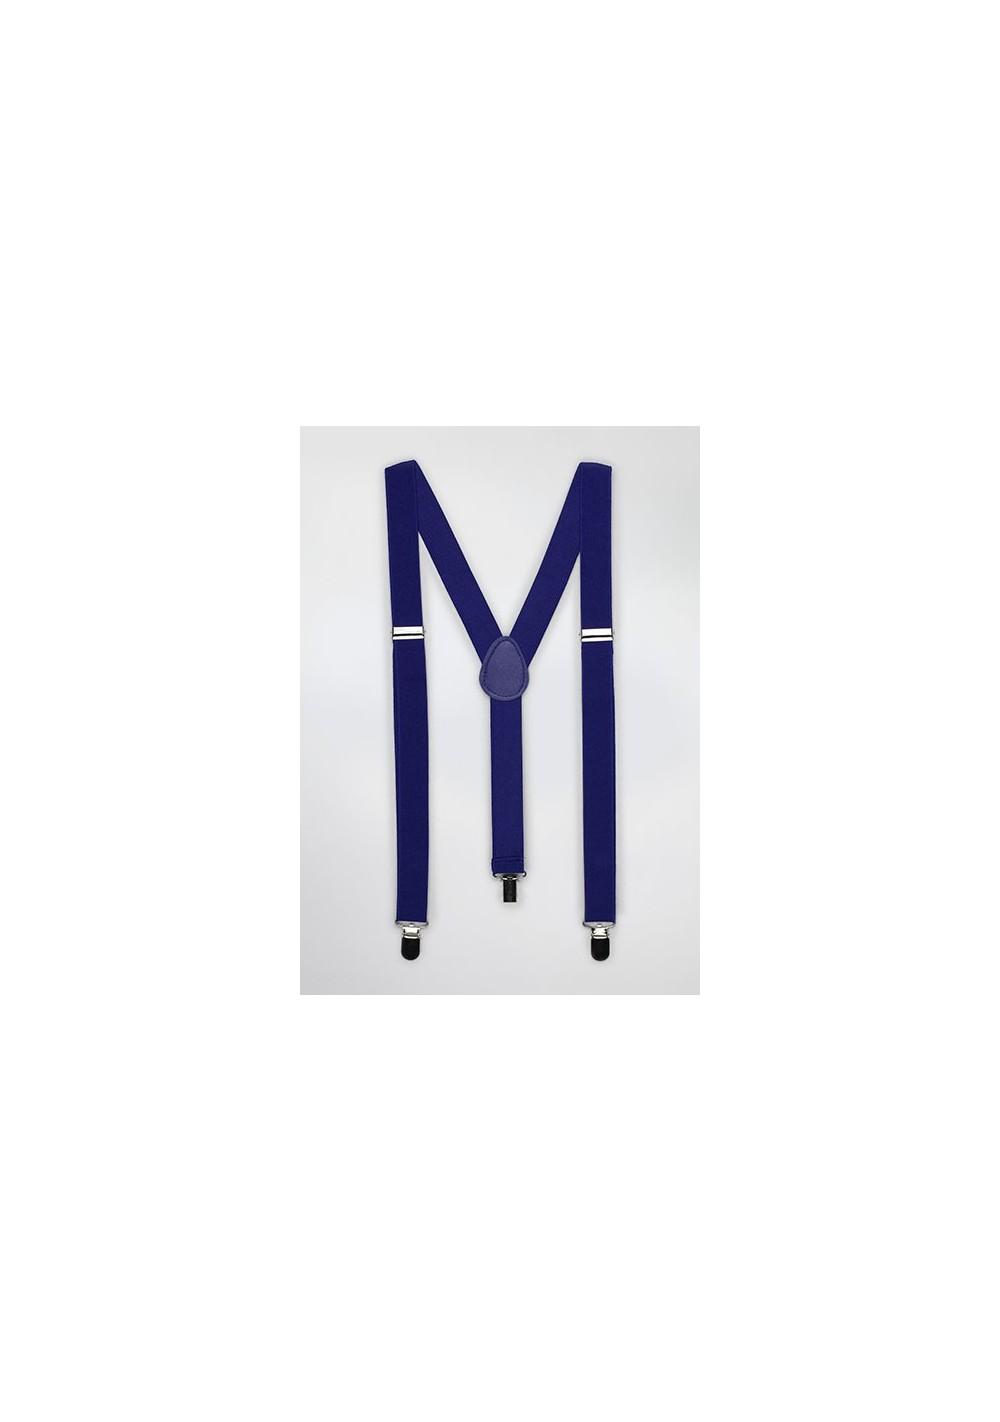 Suspenders in Horizon Blue